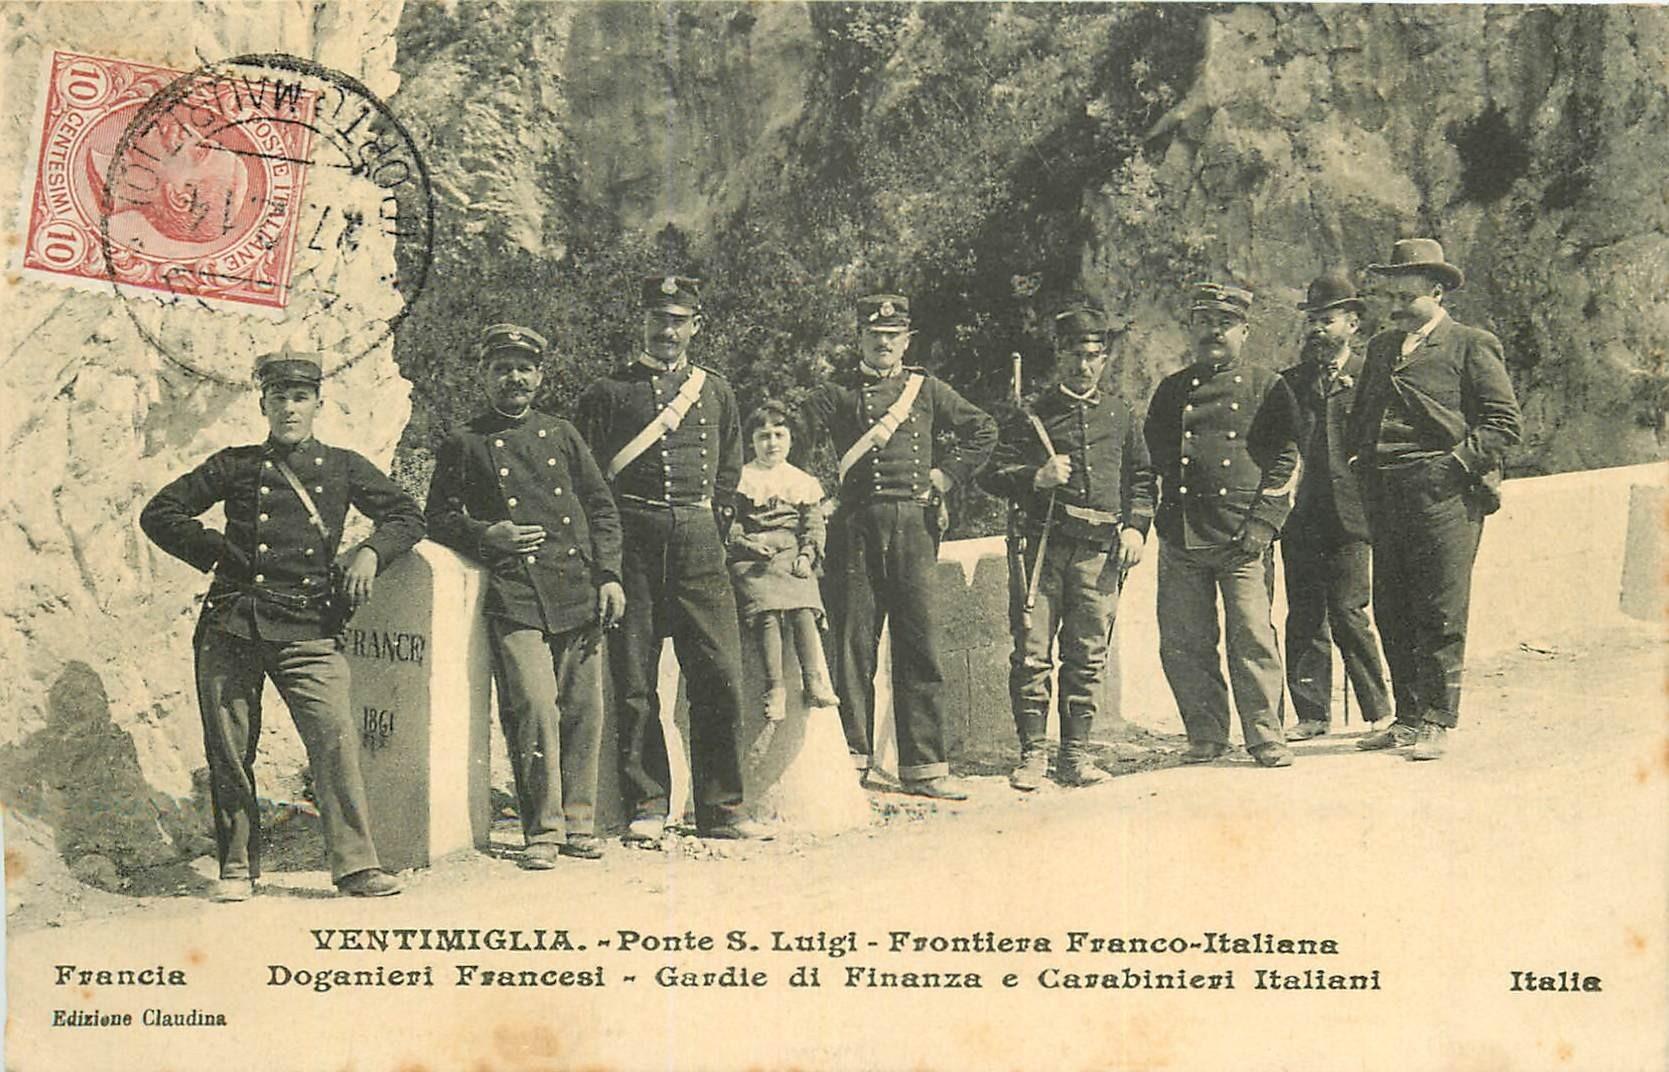 VENTIMIGLIA. Ponte Luigi Doganieri a la Frontiera 1914